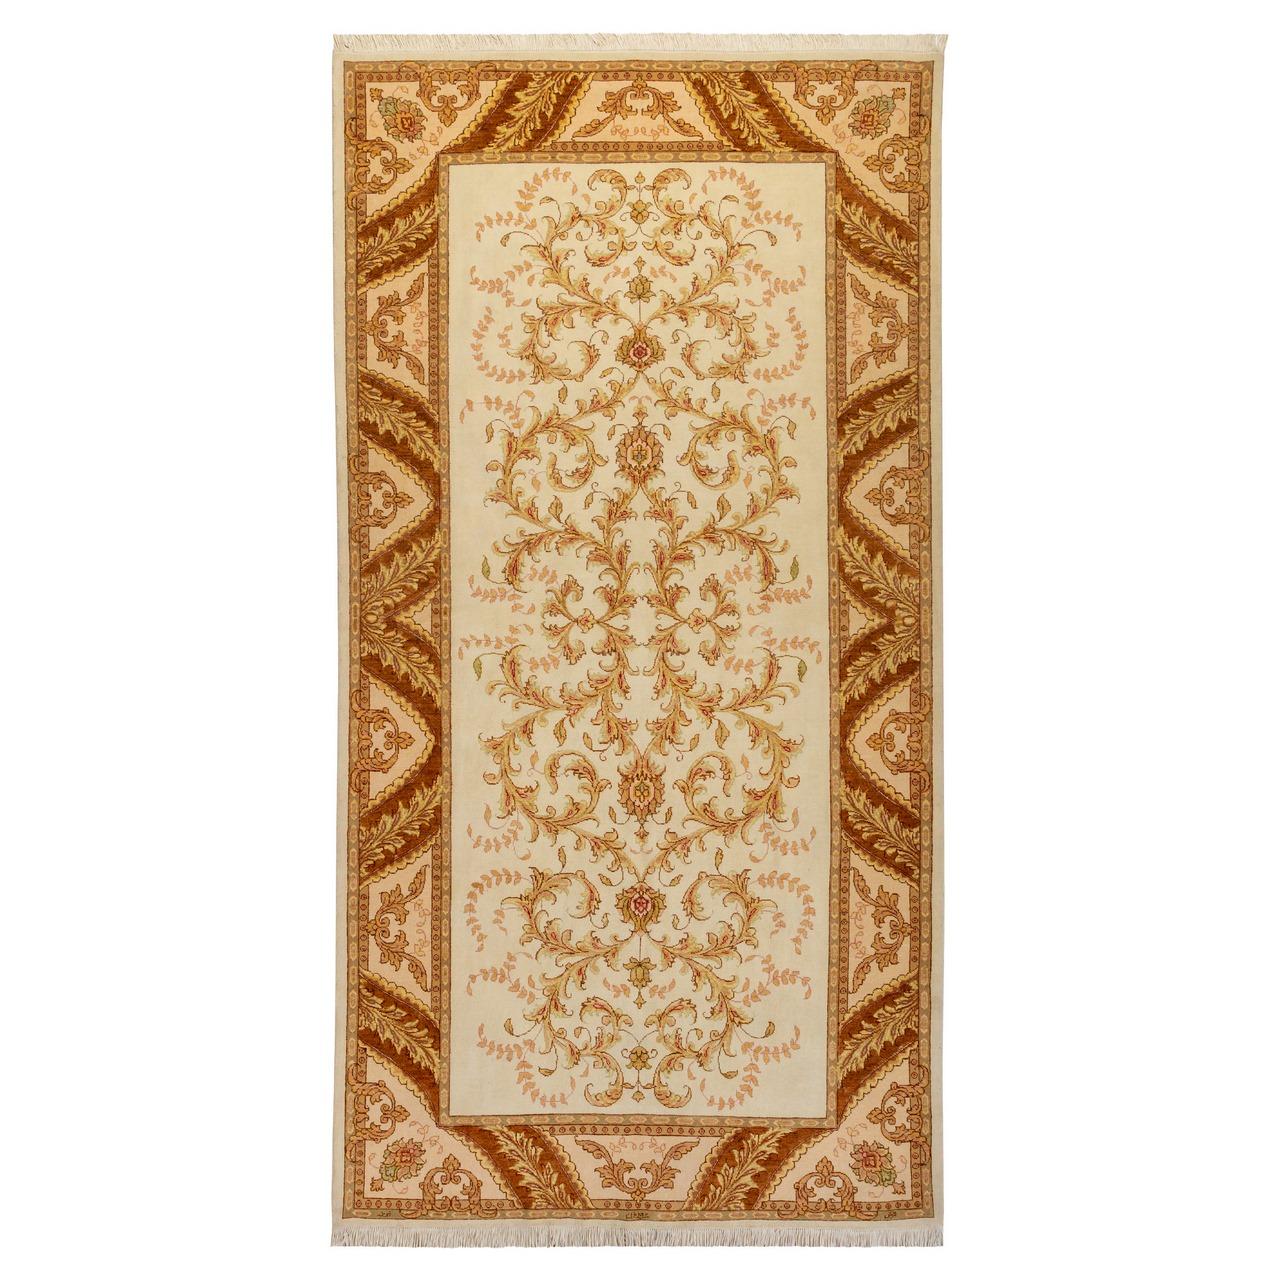 فرش دستباف پنج متری سی پرشیا کد 701227